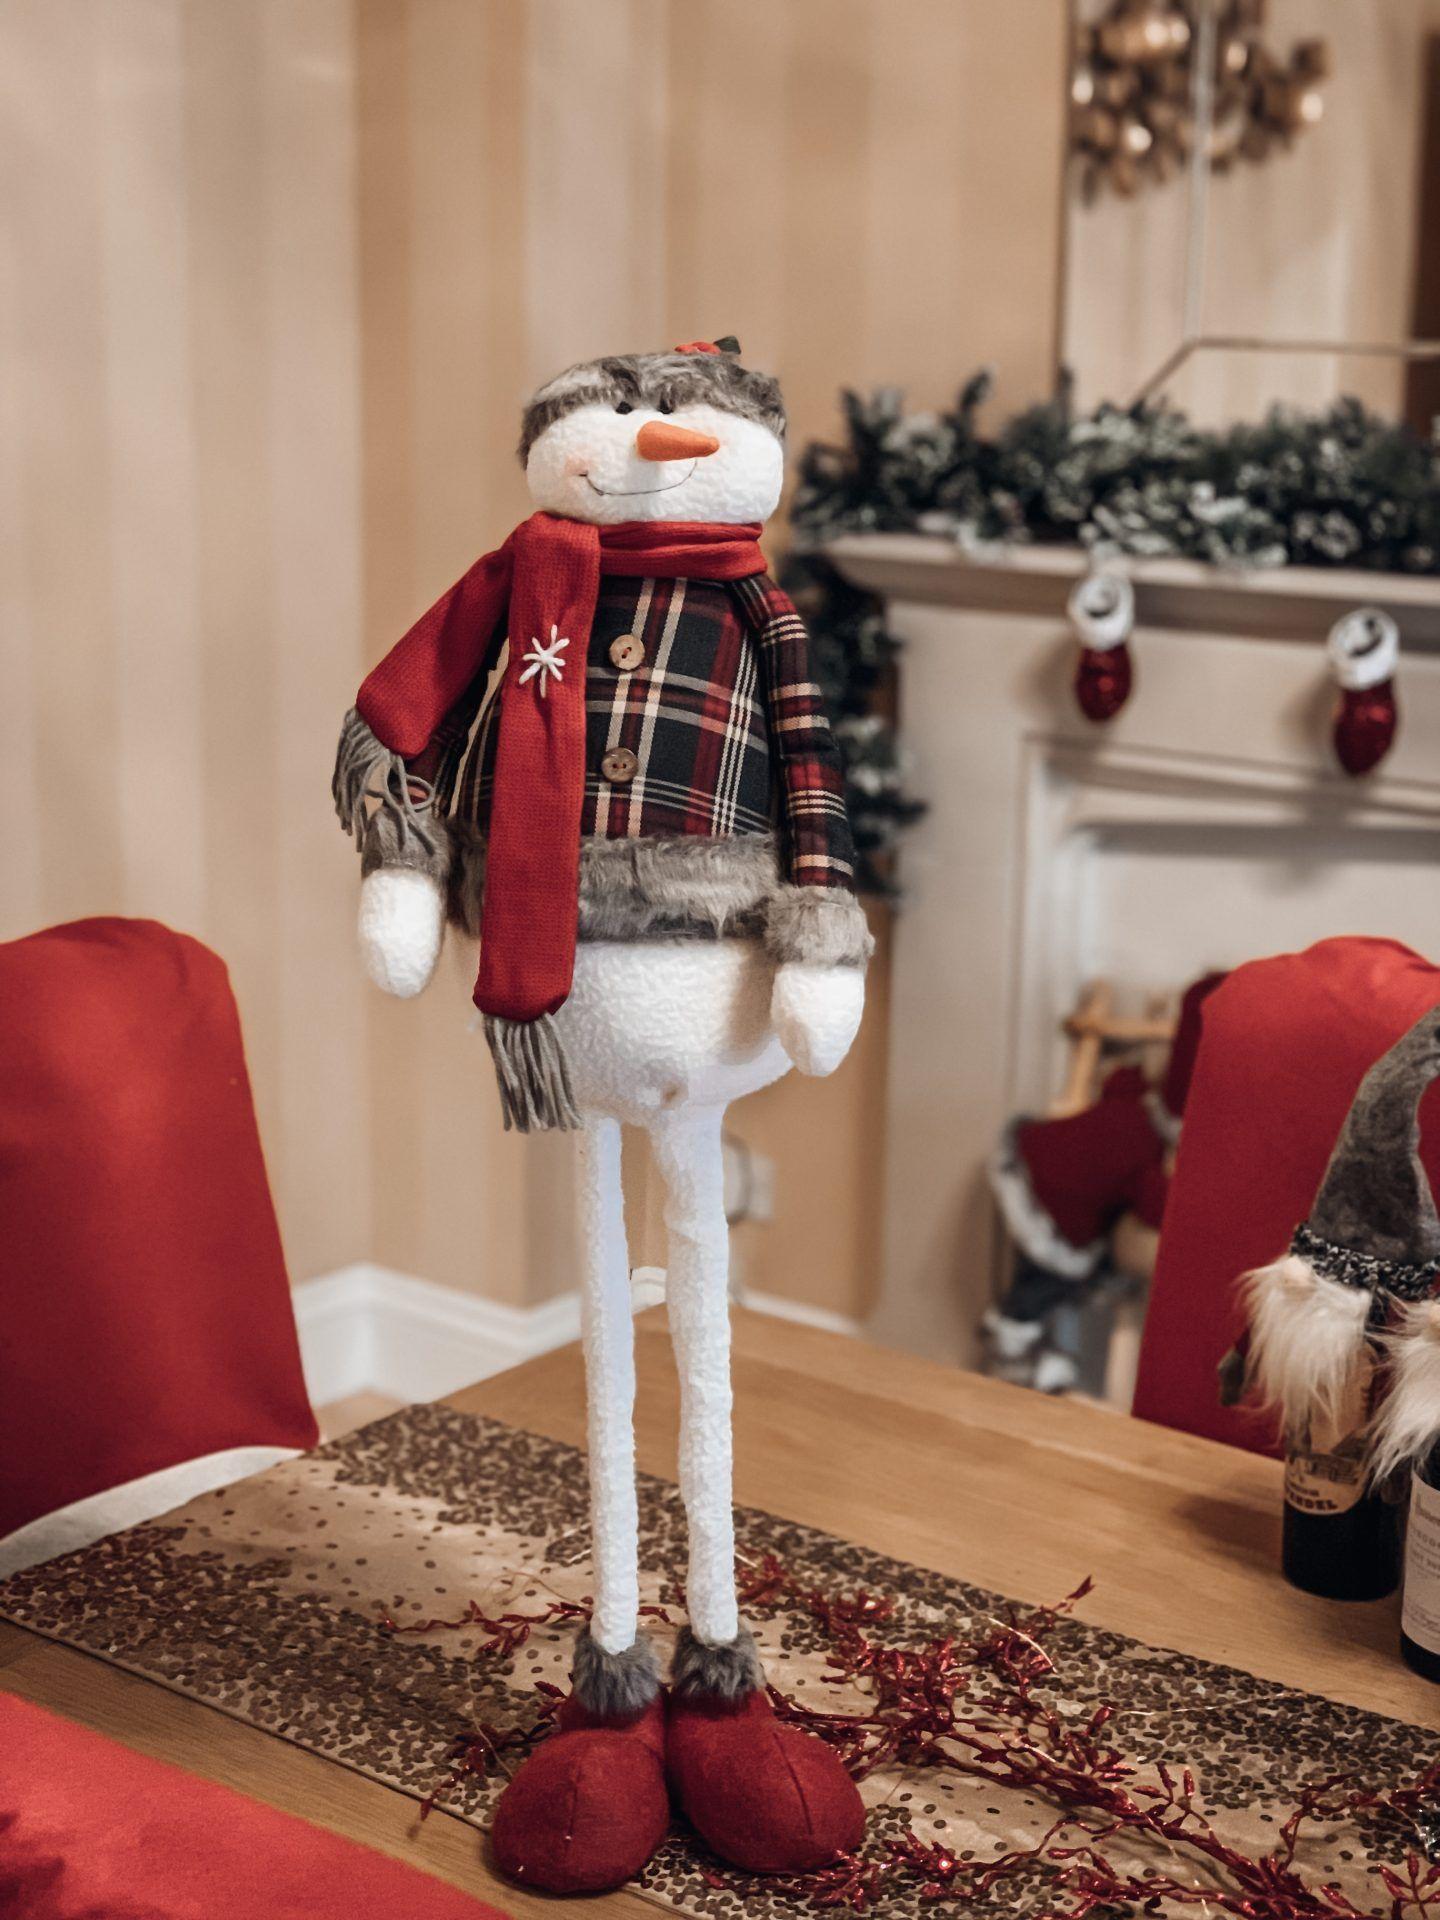 Telescopic legs Snowman - Christmas decorations